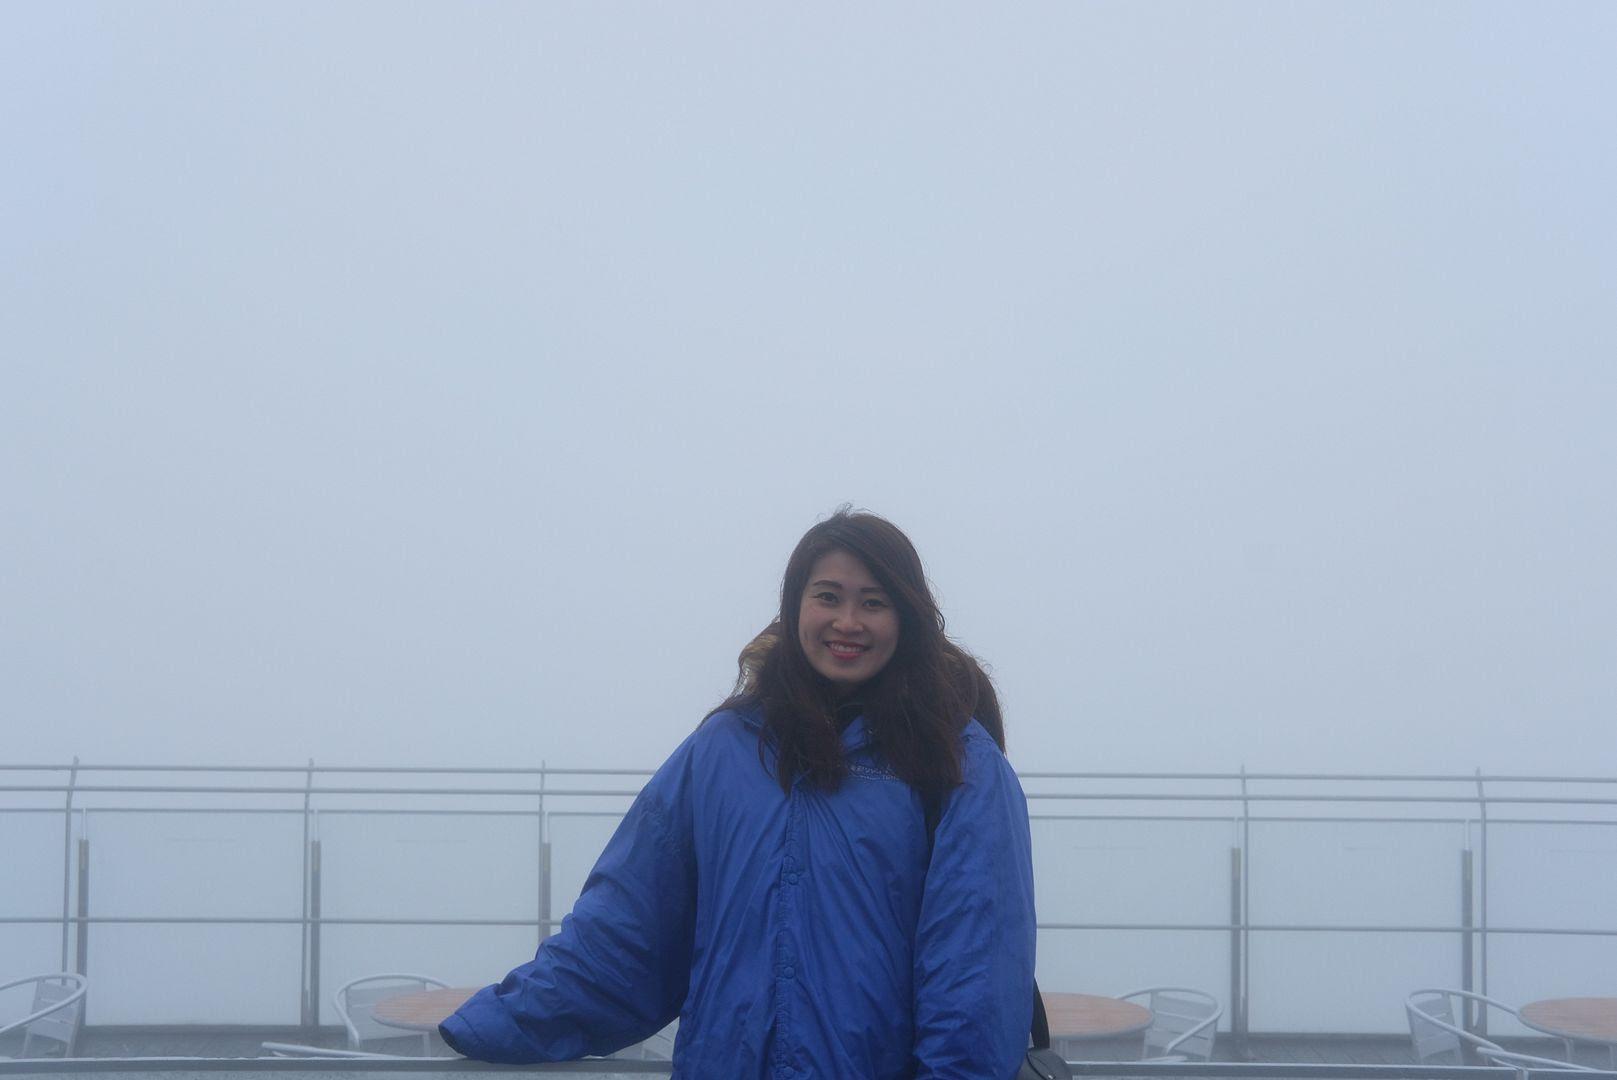 photo Unkai Terrace Hokkaido 11.jpg